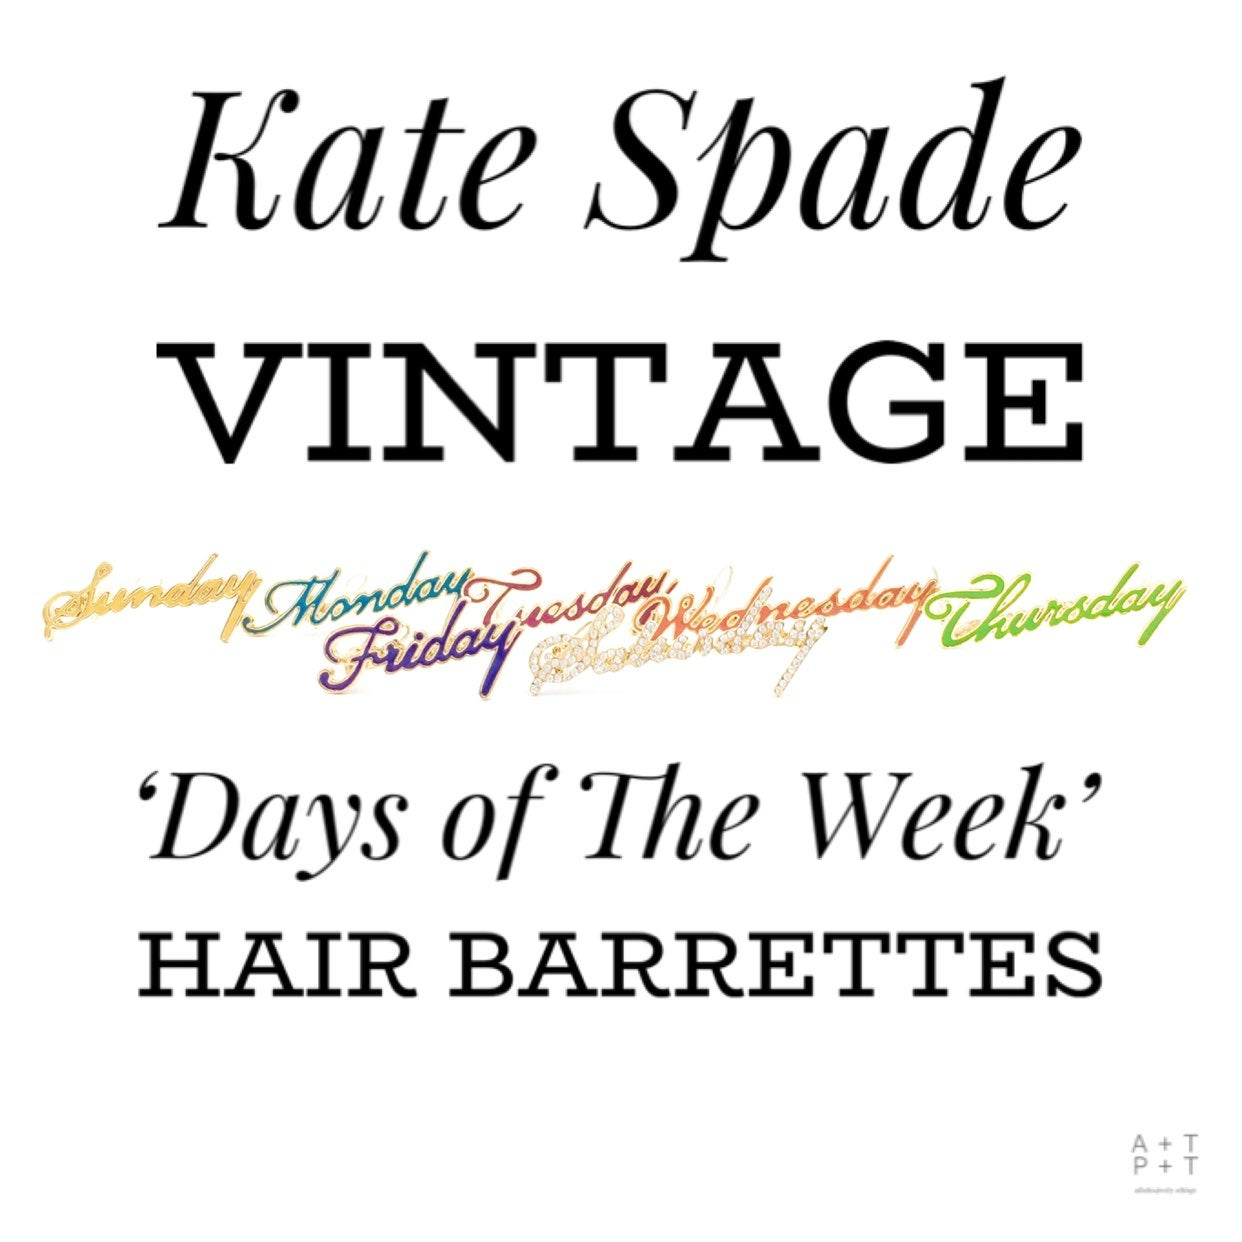 Kate Spade Vintage Hair Barrettes